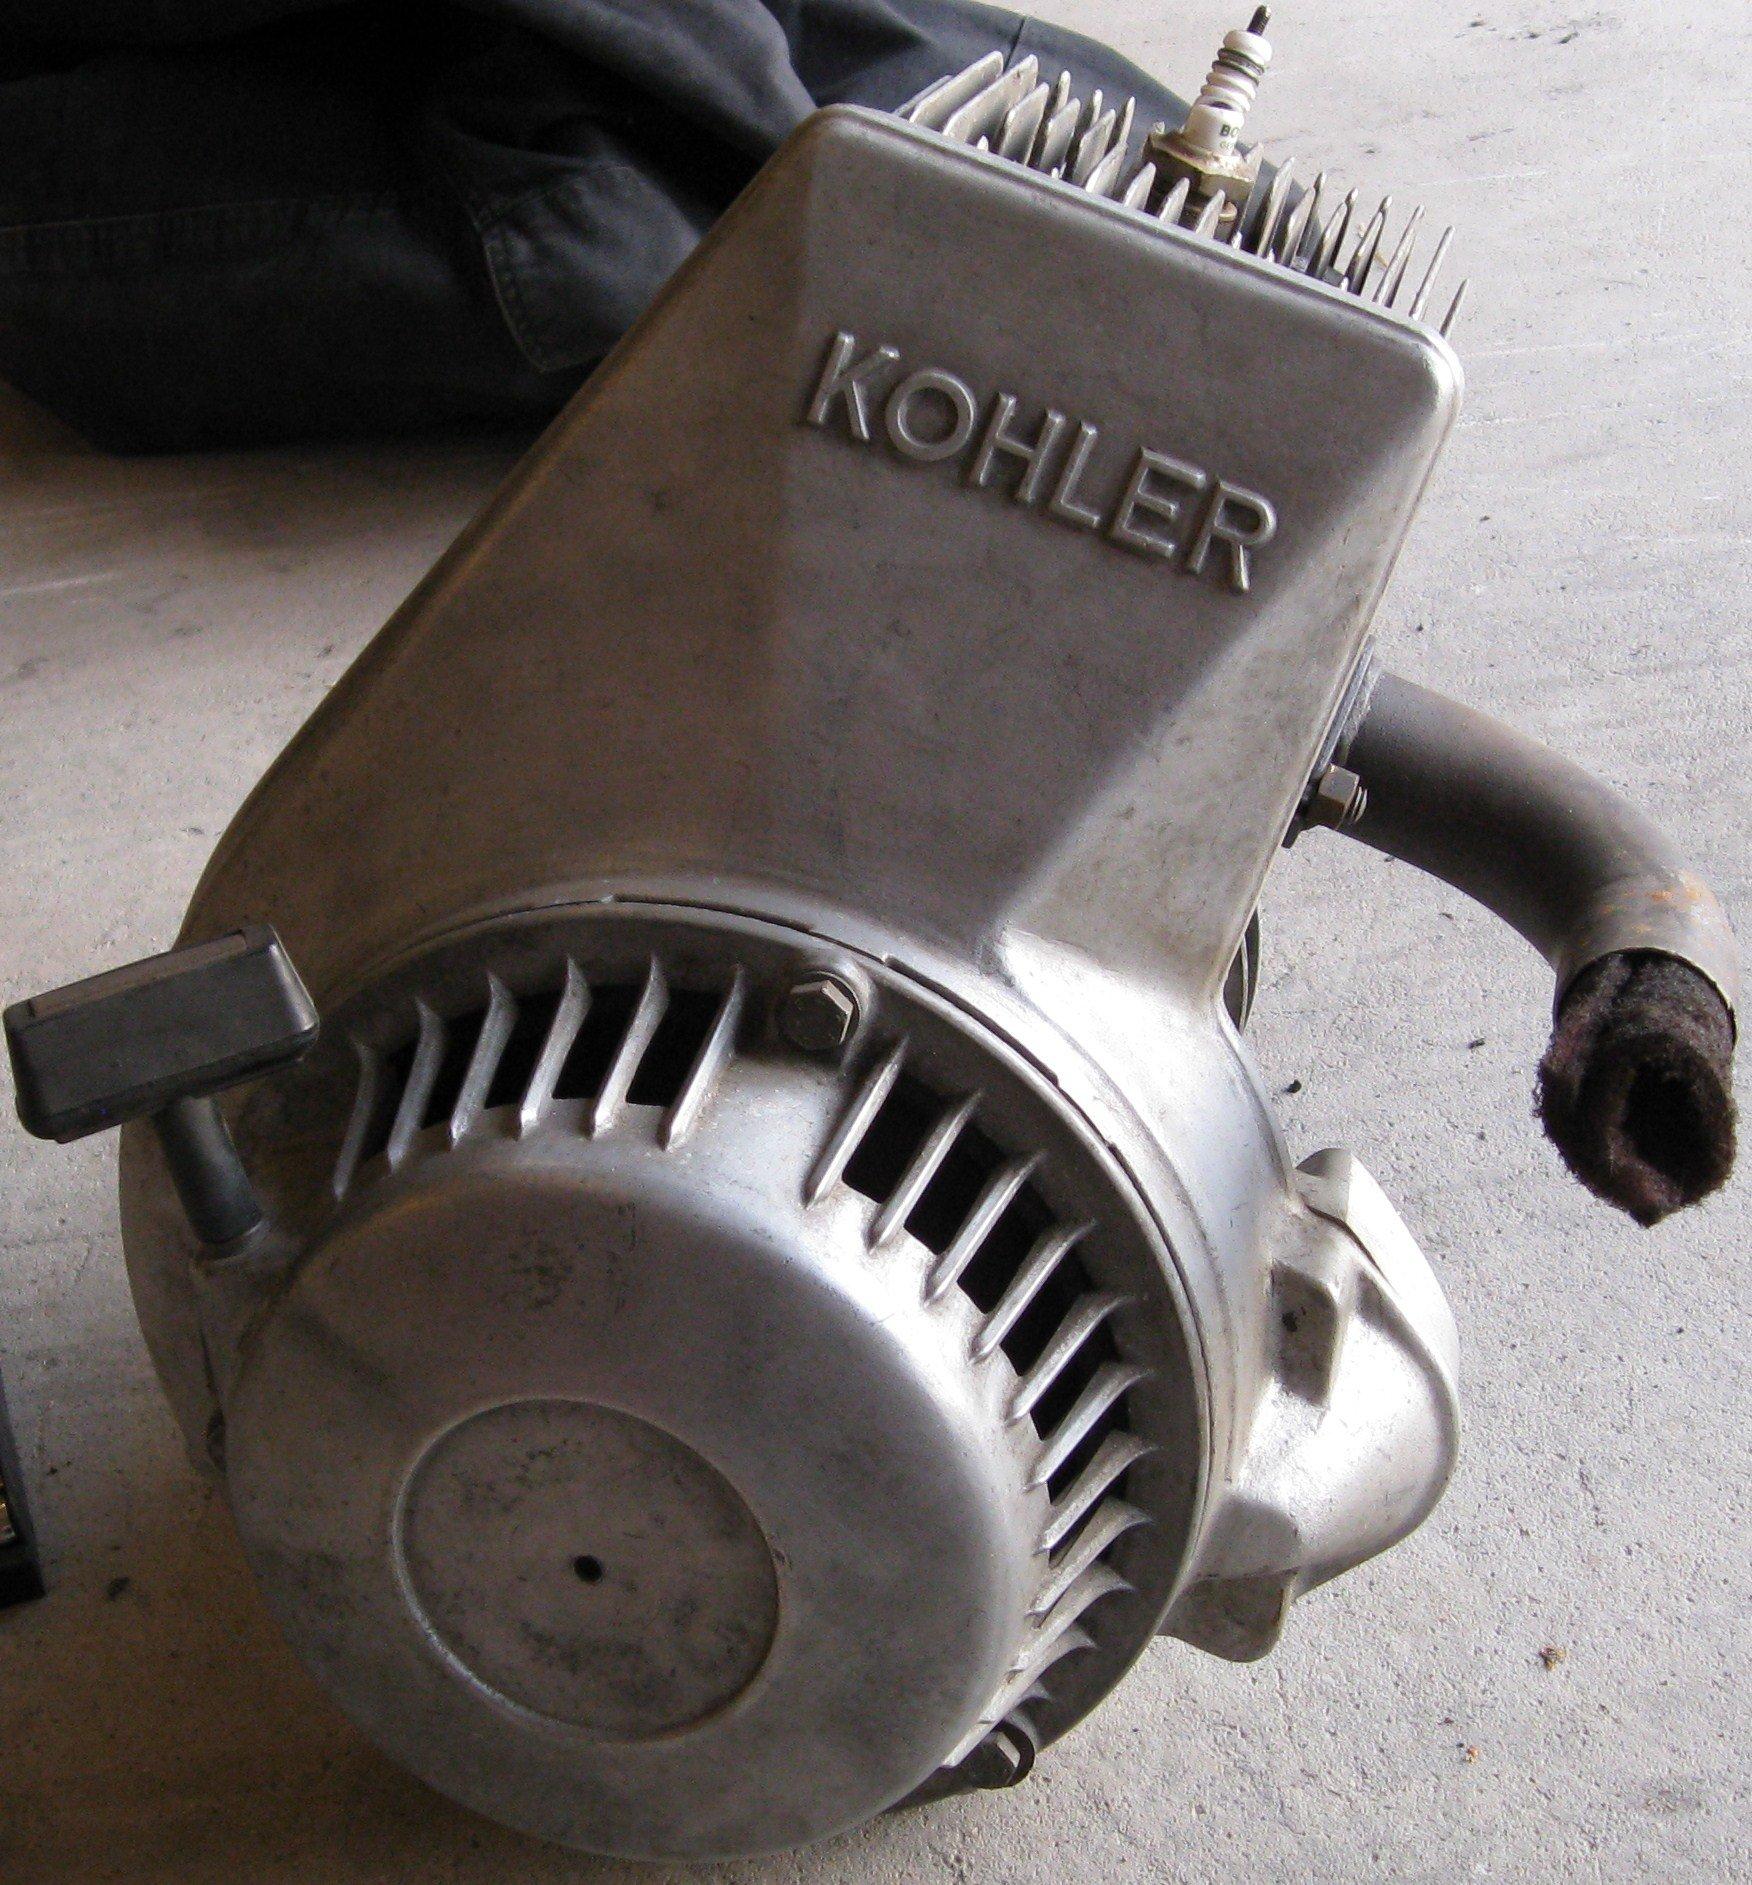 190407d1270162751 kohler engine what do i have 551 295 kohler wiring diagram kohler small engine wiring diagram Kohler Wiring Diagram Manual at honlapkeszites.co